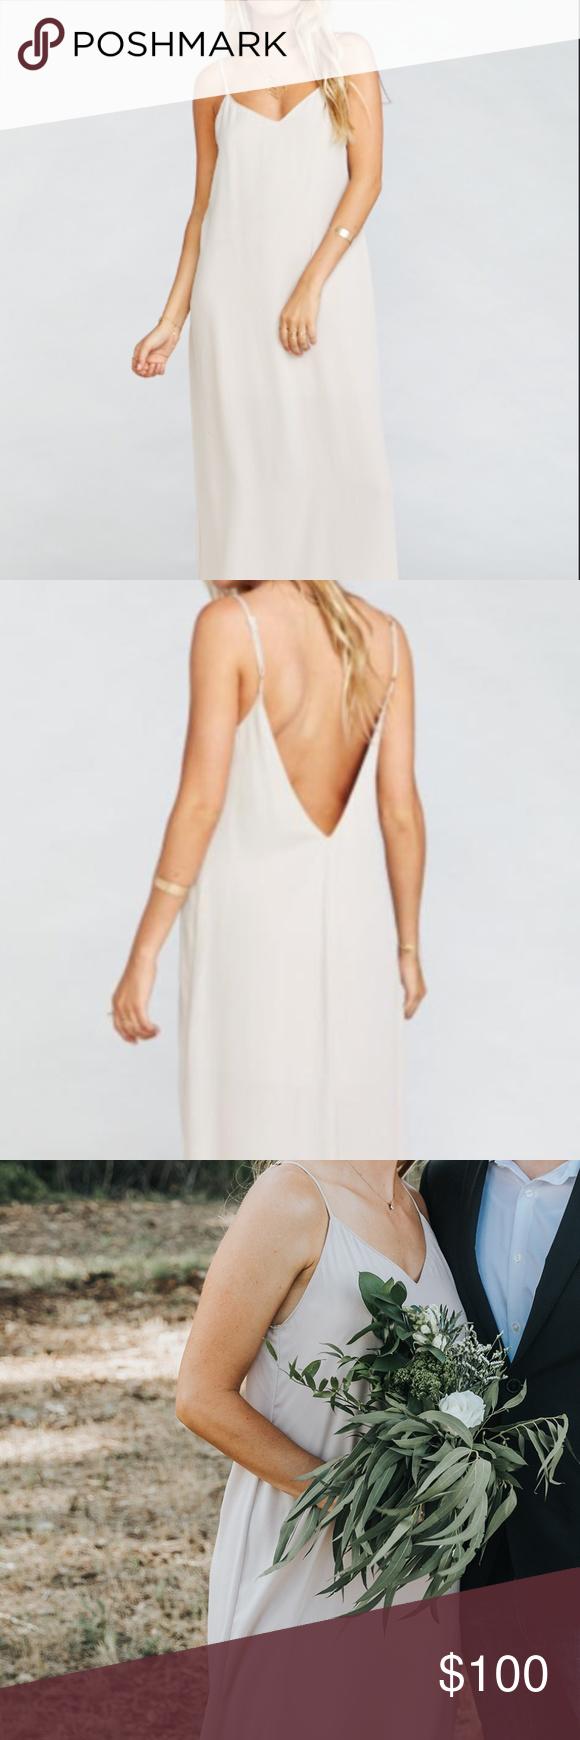 Jolie Maxi Dress Show Me Your Mumu Maxi Bridesmaid Dresses Gowns Of Elegance Dresses [ 1740 x 580 Pixel ]